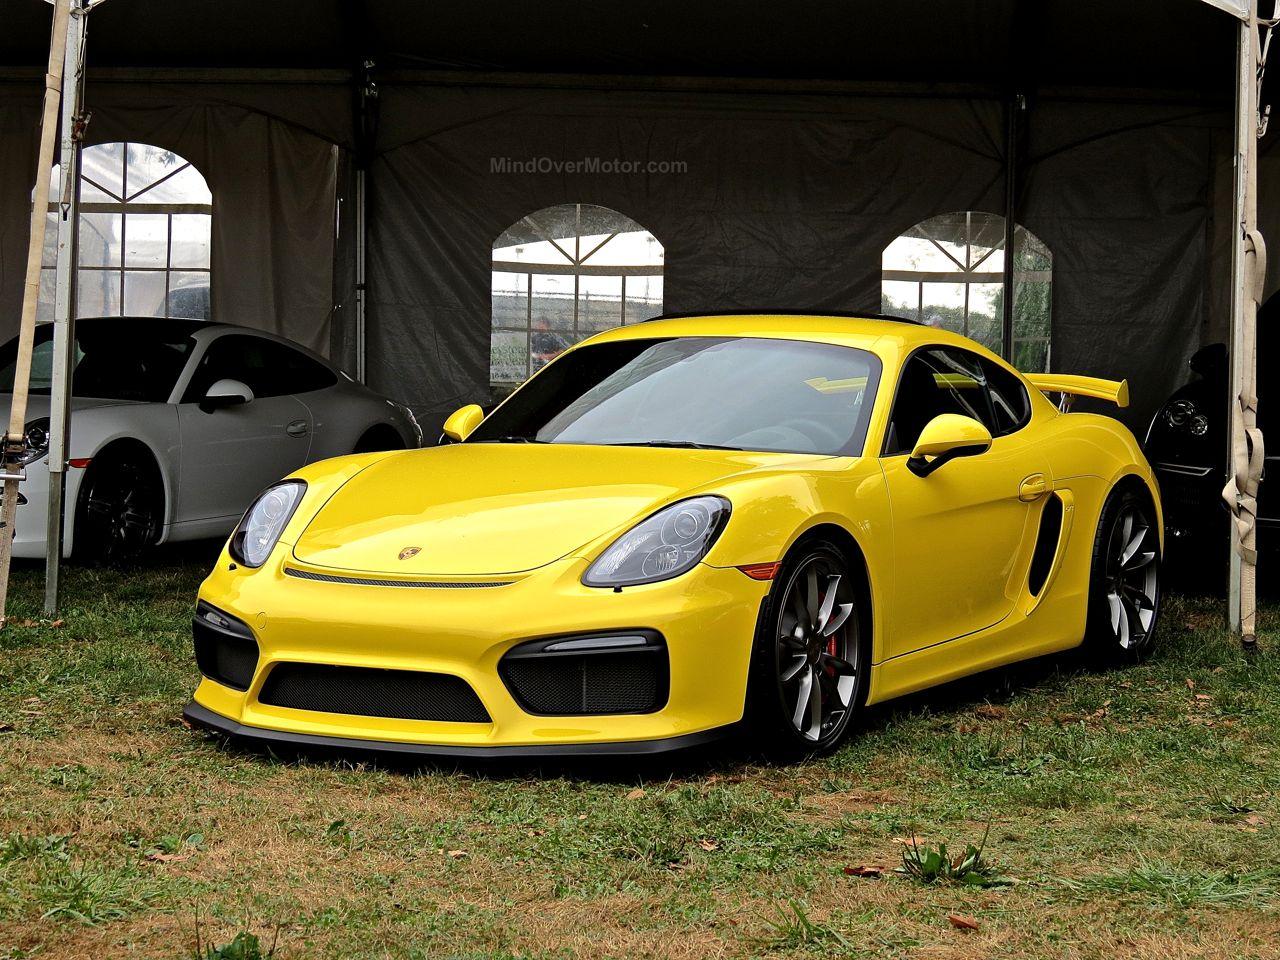 Radnor Hunt Porsche Cayman GT4 Yellow